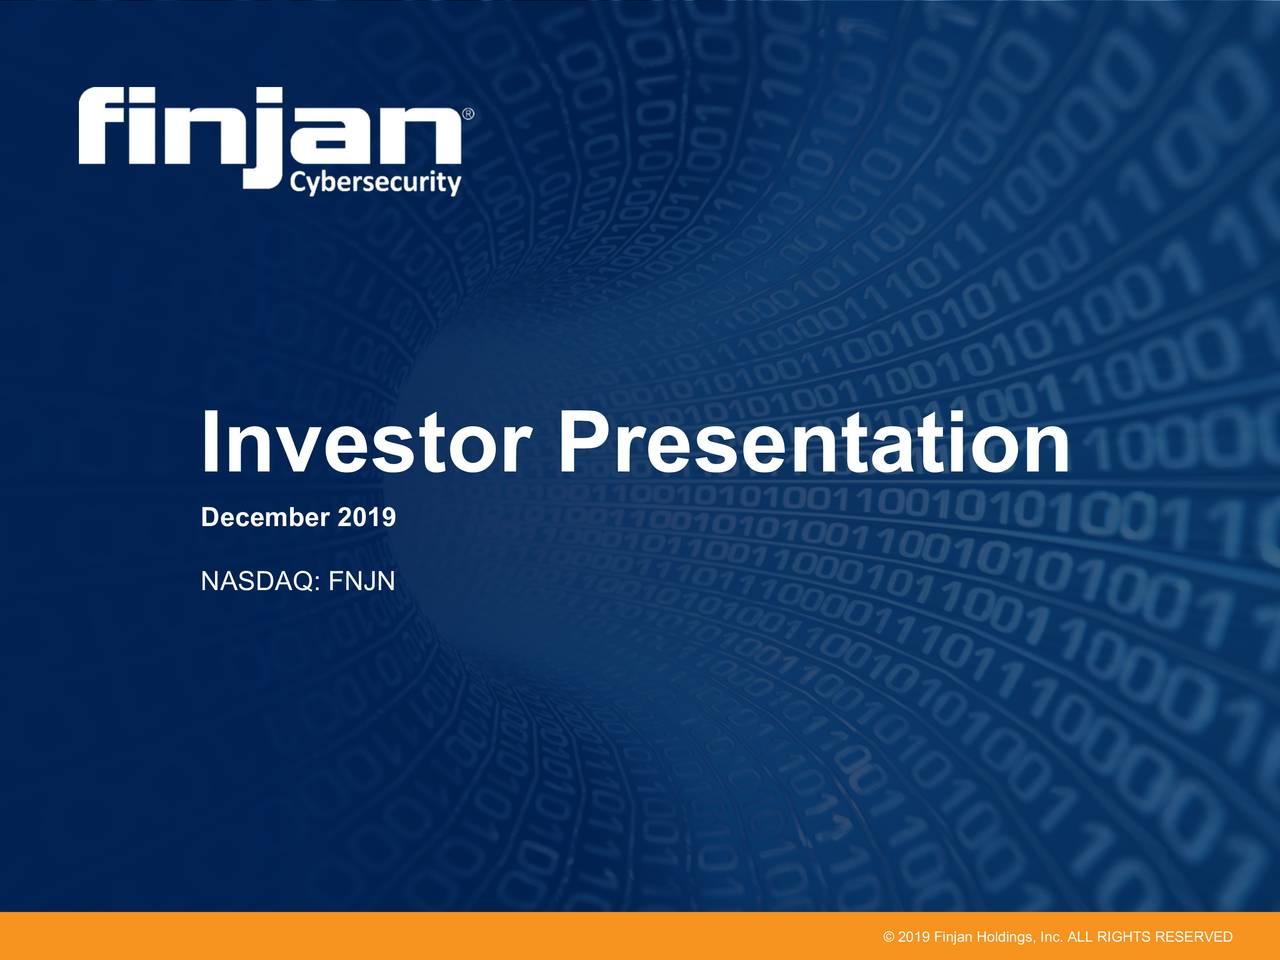 Finjan Holdings (FNJN) Investor Presentation - Slideshow - Finjan Holdings, Inc. (NASDAQ:FNJN) | Seeking Alpha